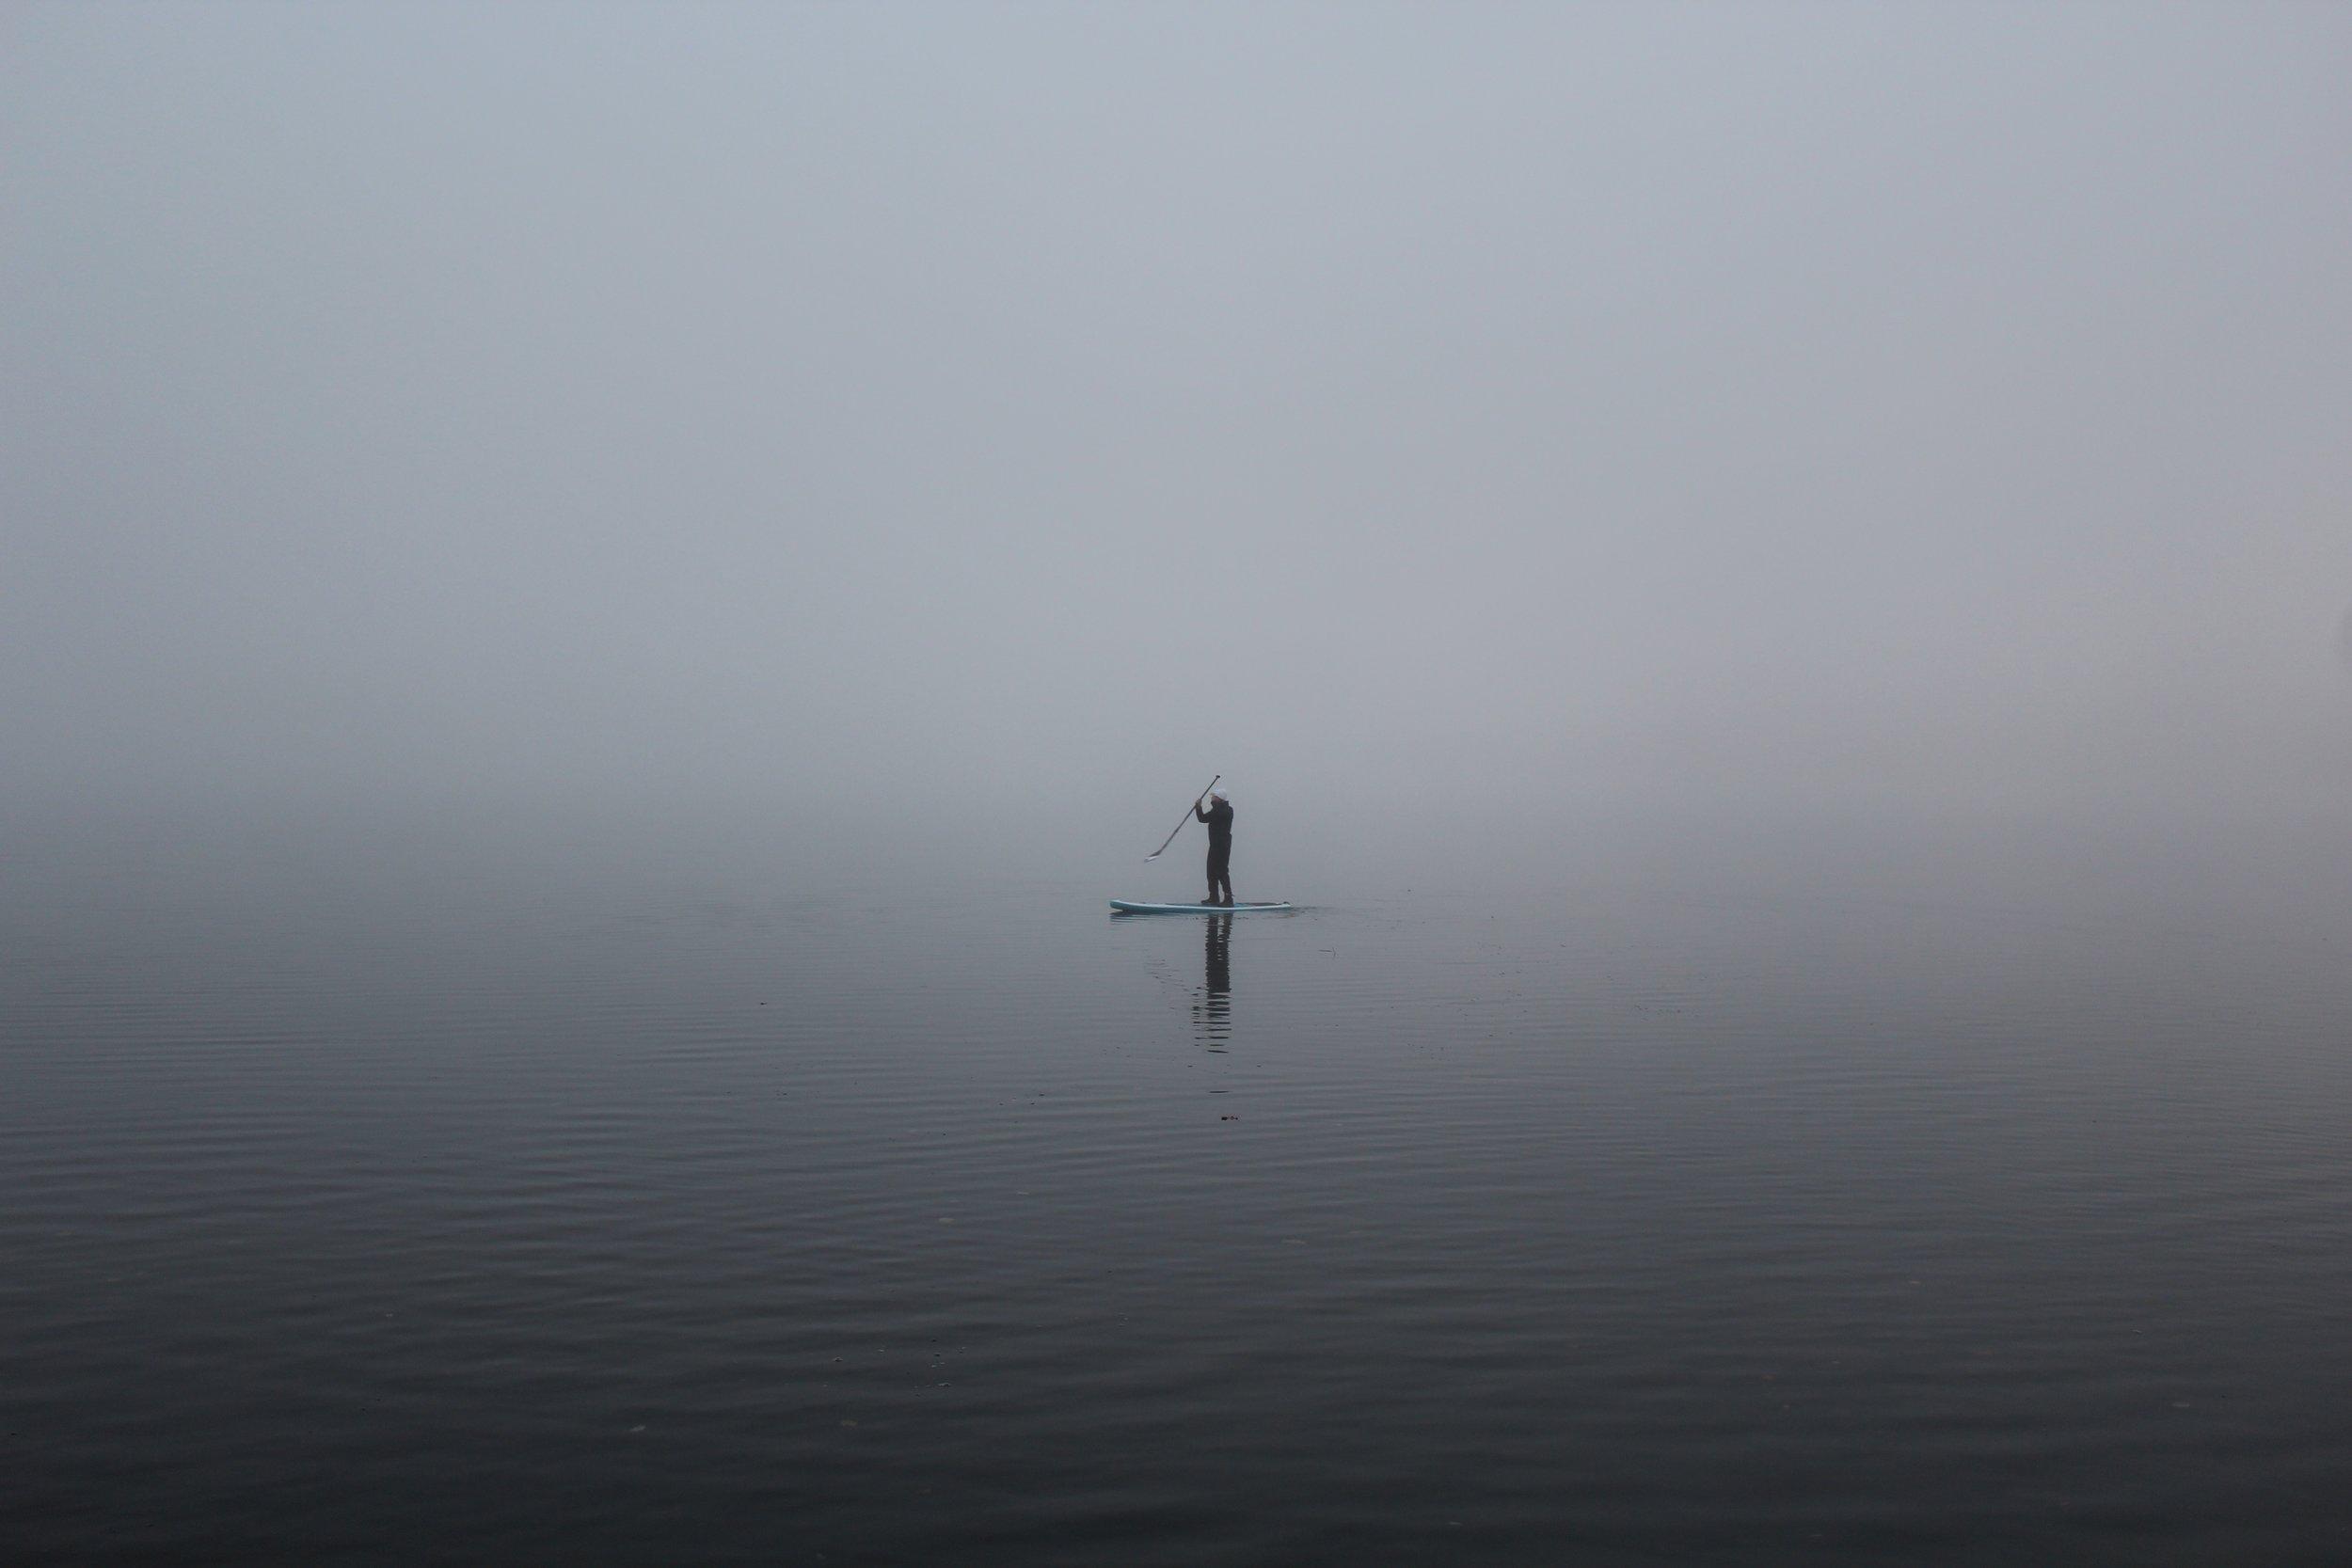 Paddling in dense fog on Windermere